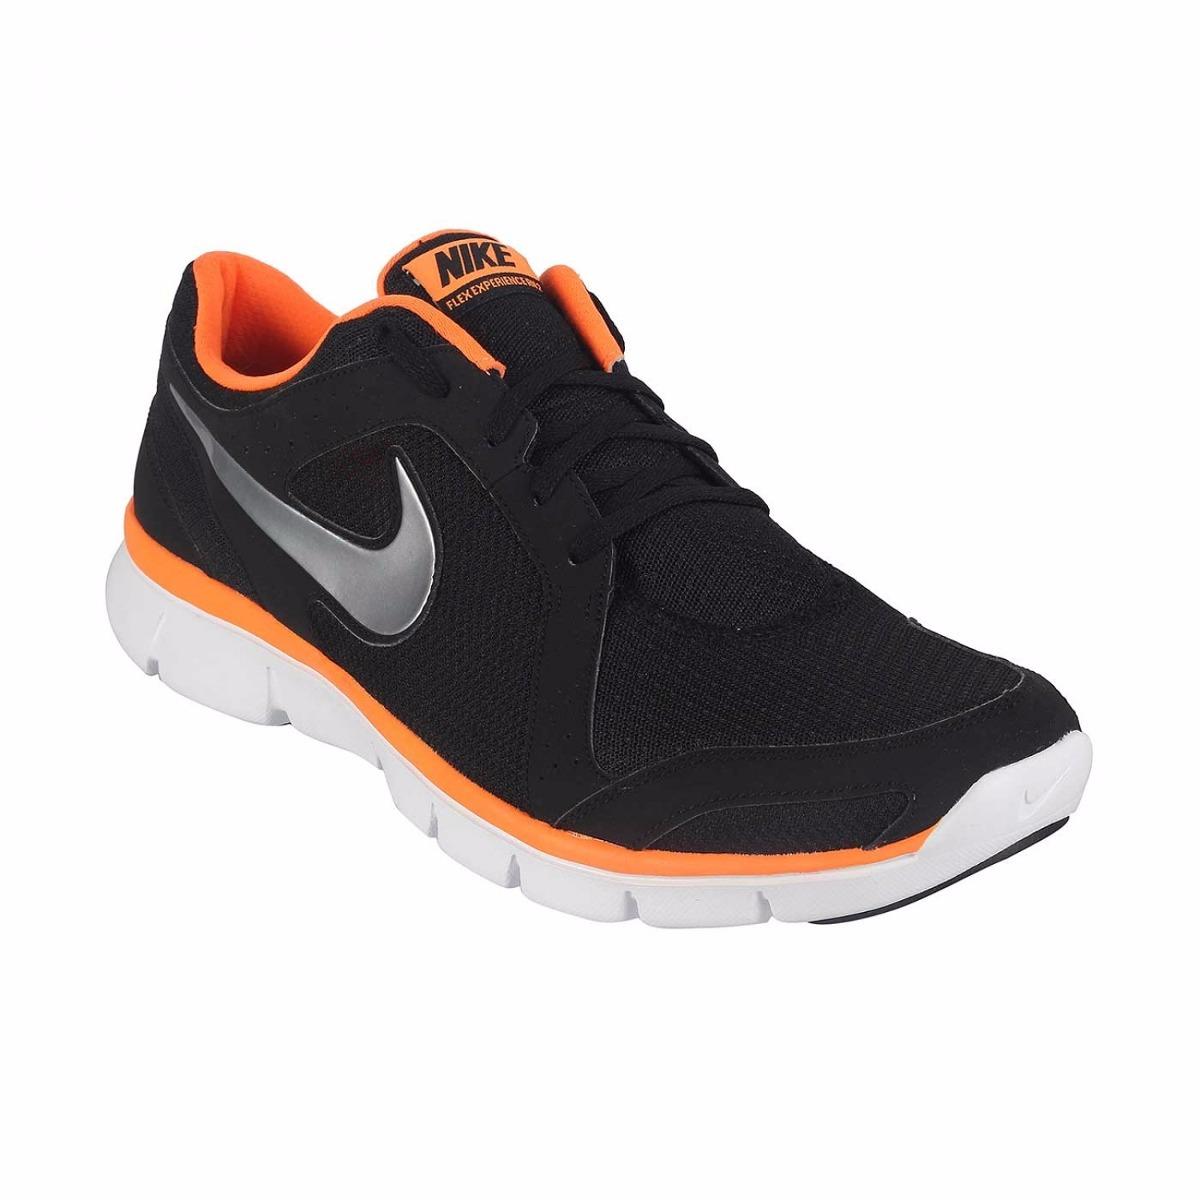 tenis nike men s flex experience rn 2 running negro naranja. Cargando zoom. 2c239a587b81b